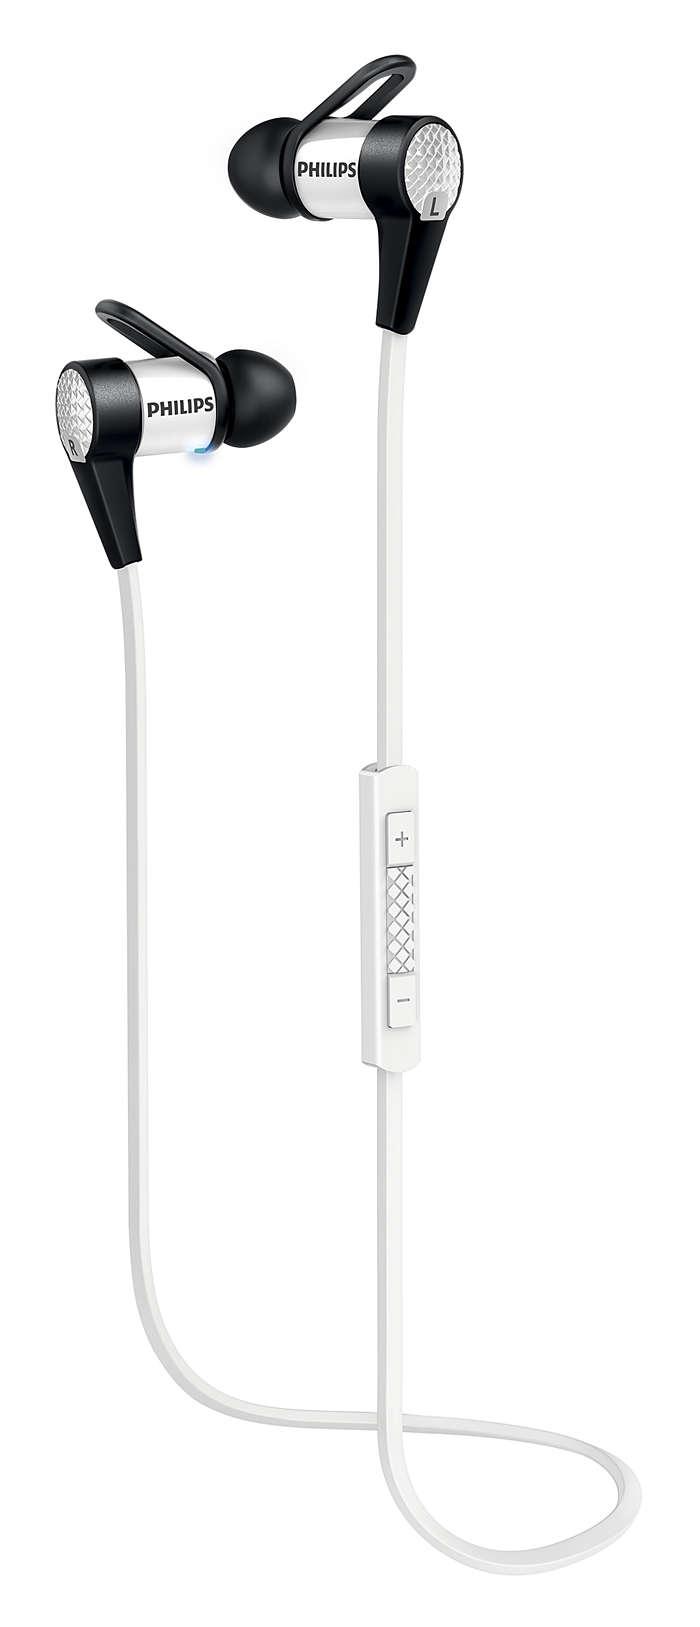 TRÅDLÖS in-ear, enkel NFC-parkoppling